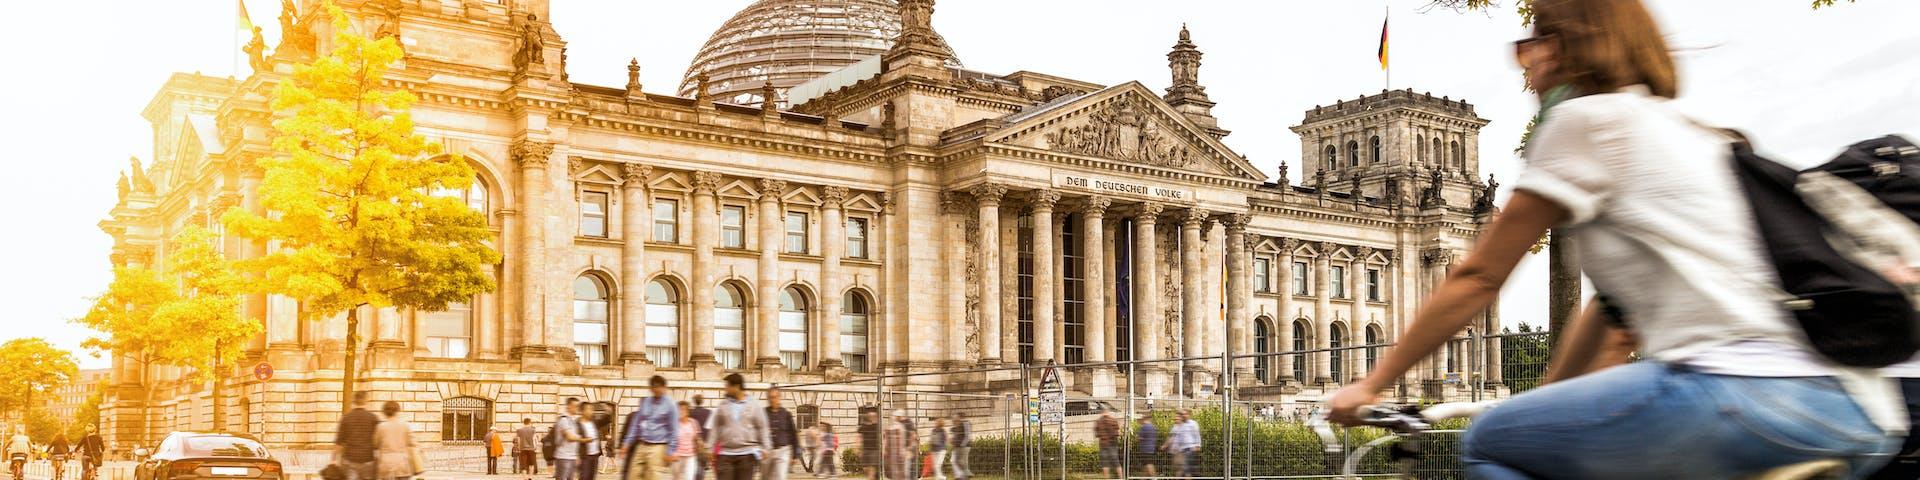 Top 10 Most International Universities in Germany - MastersPortal com